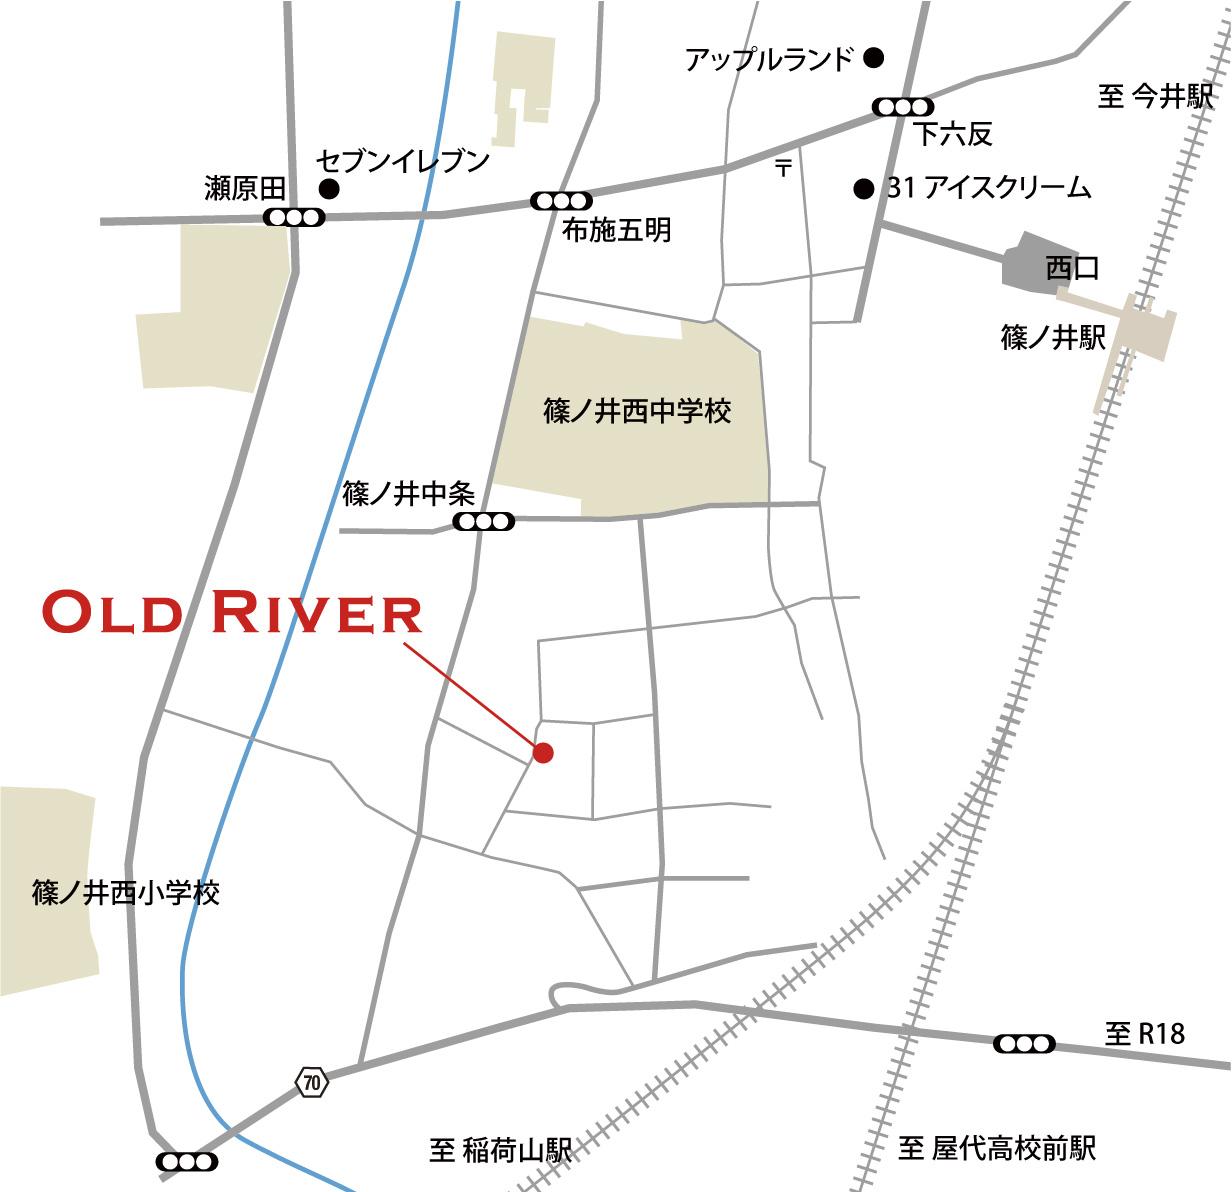 OLD RIVERの場所_f0255704_12141581.jpg